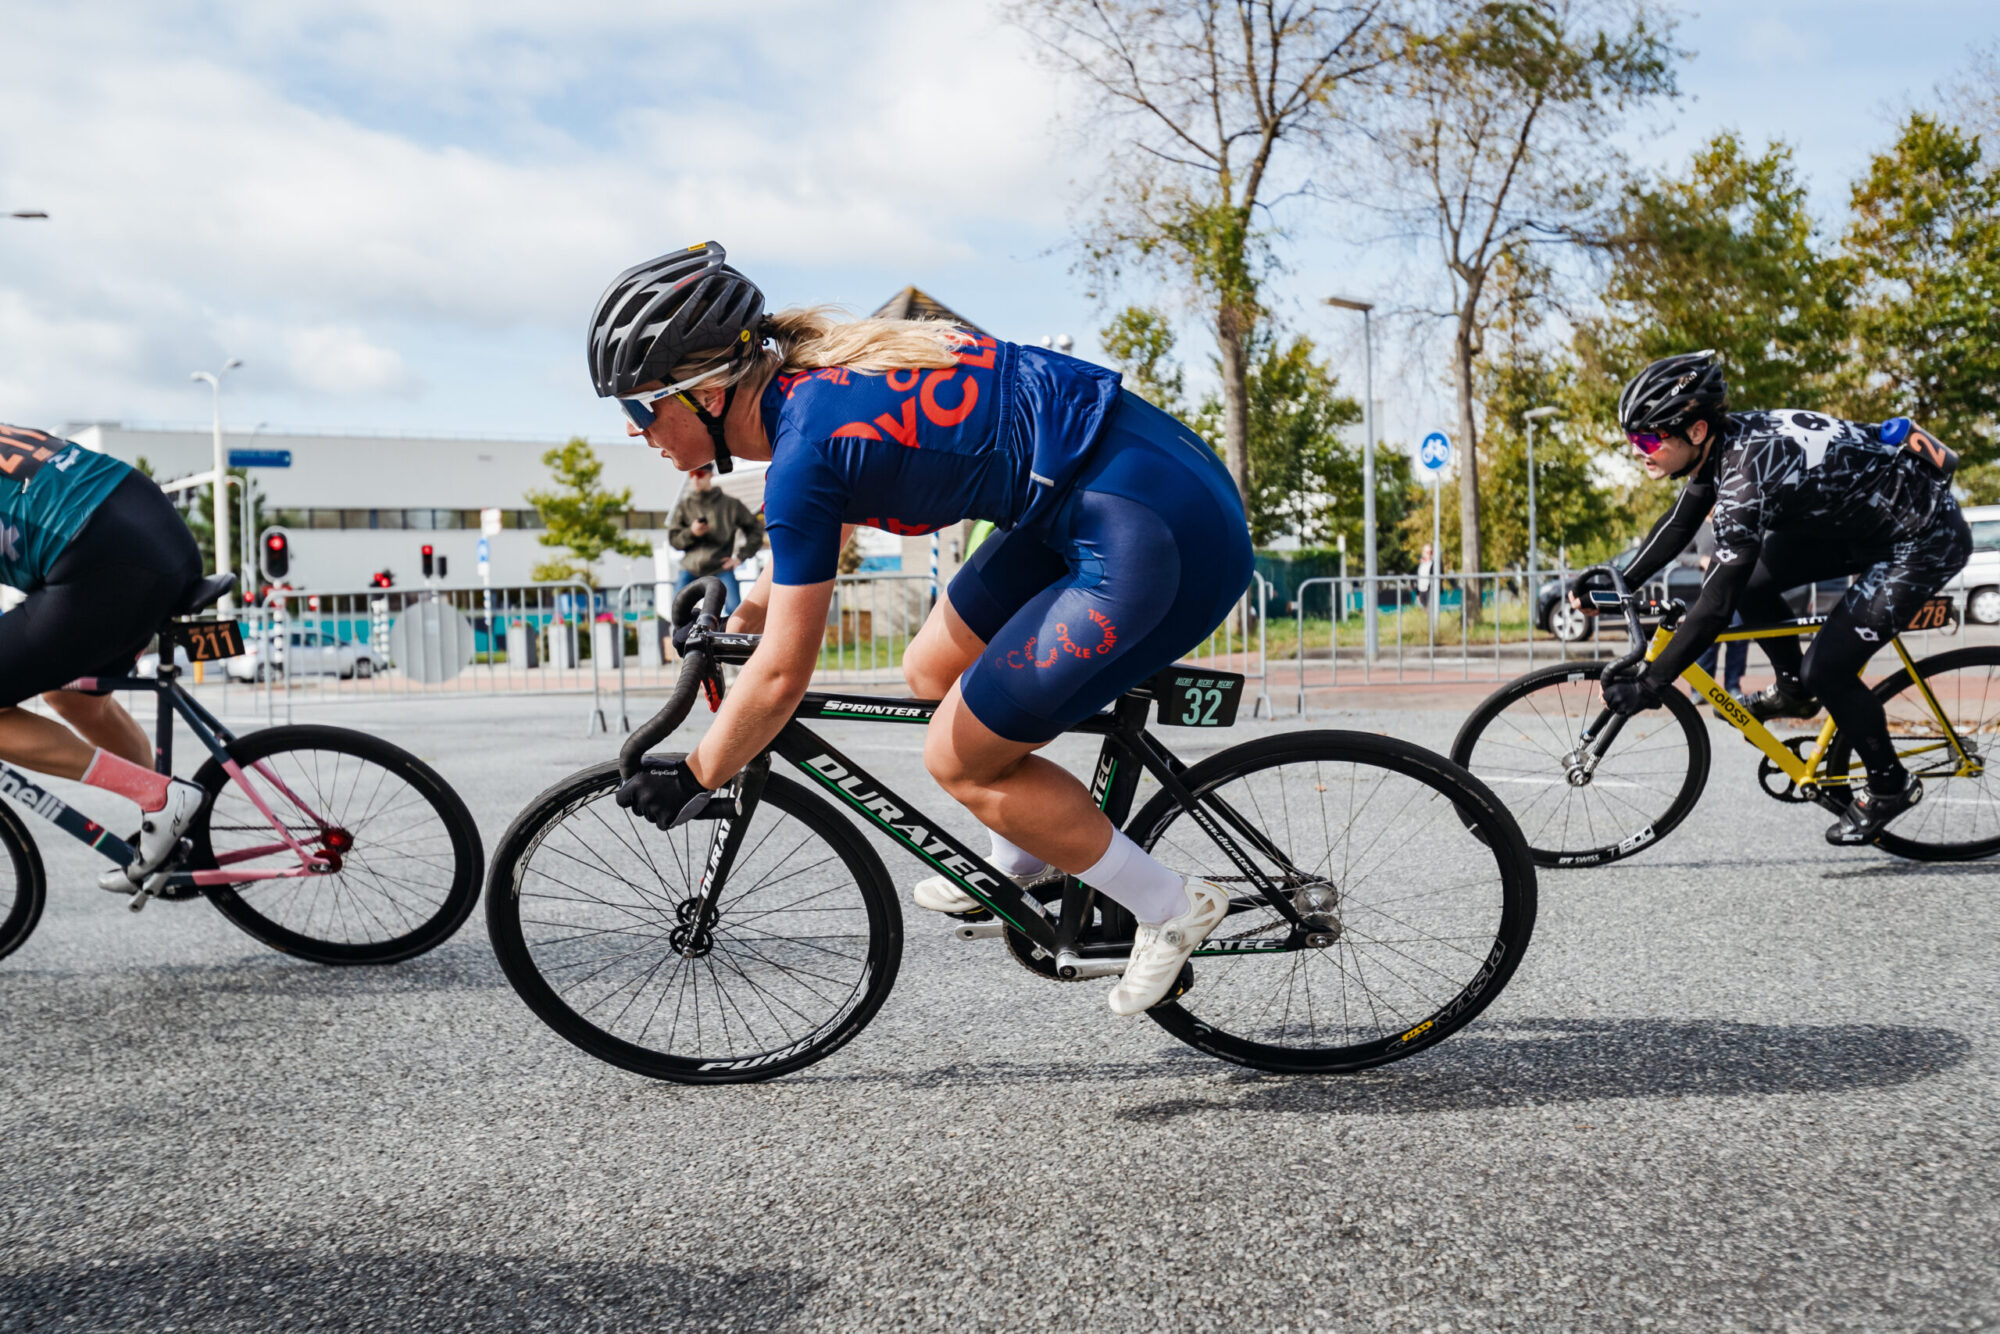 Isabel Tambach in last NL Crit race of 2020 season